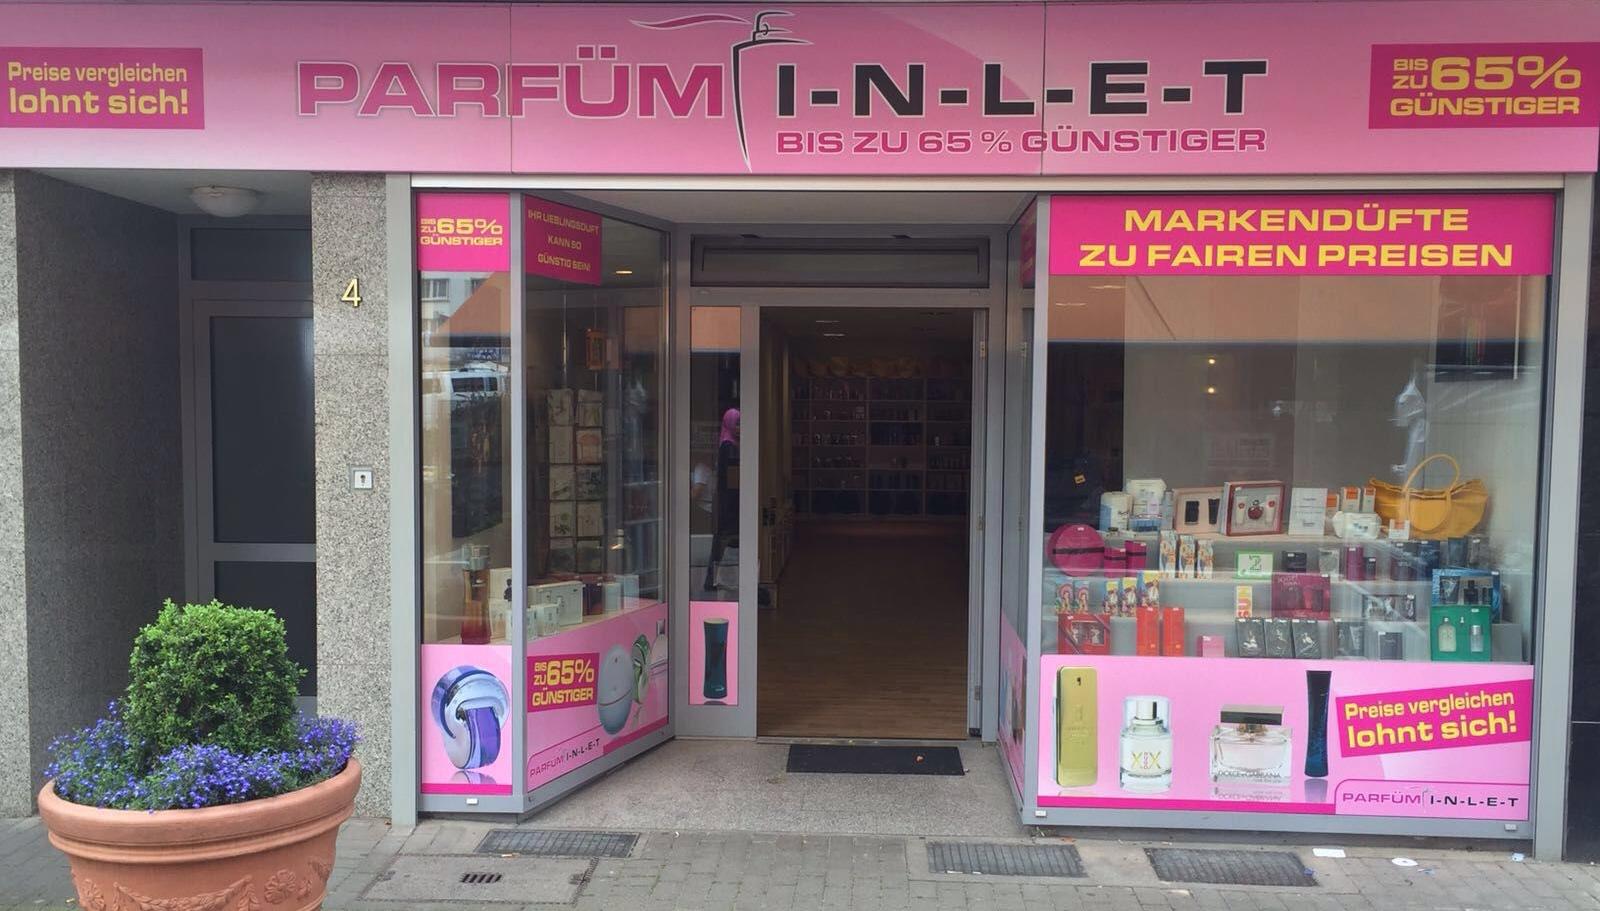 parfum-inlet-gelsenkirchen1